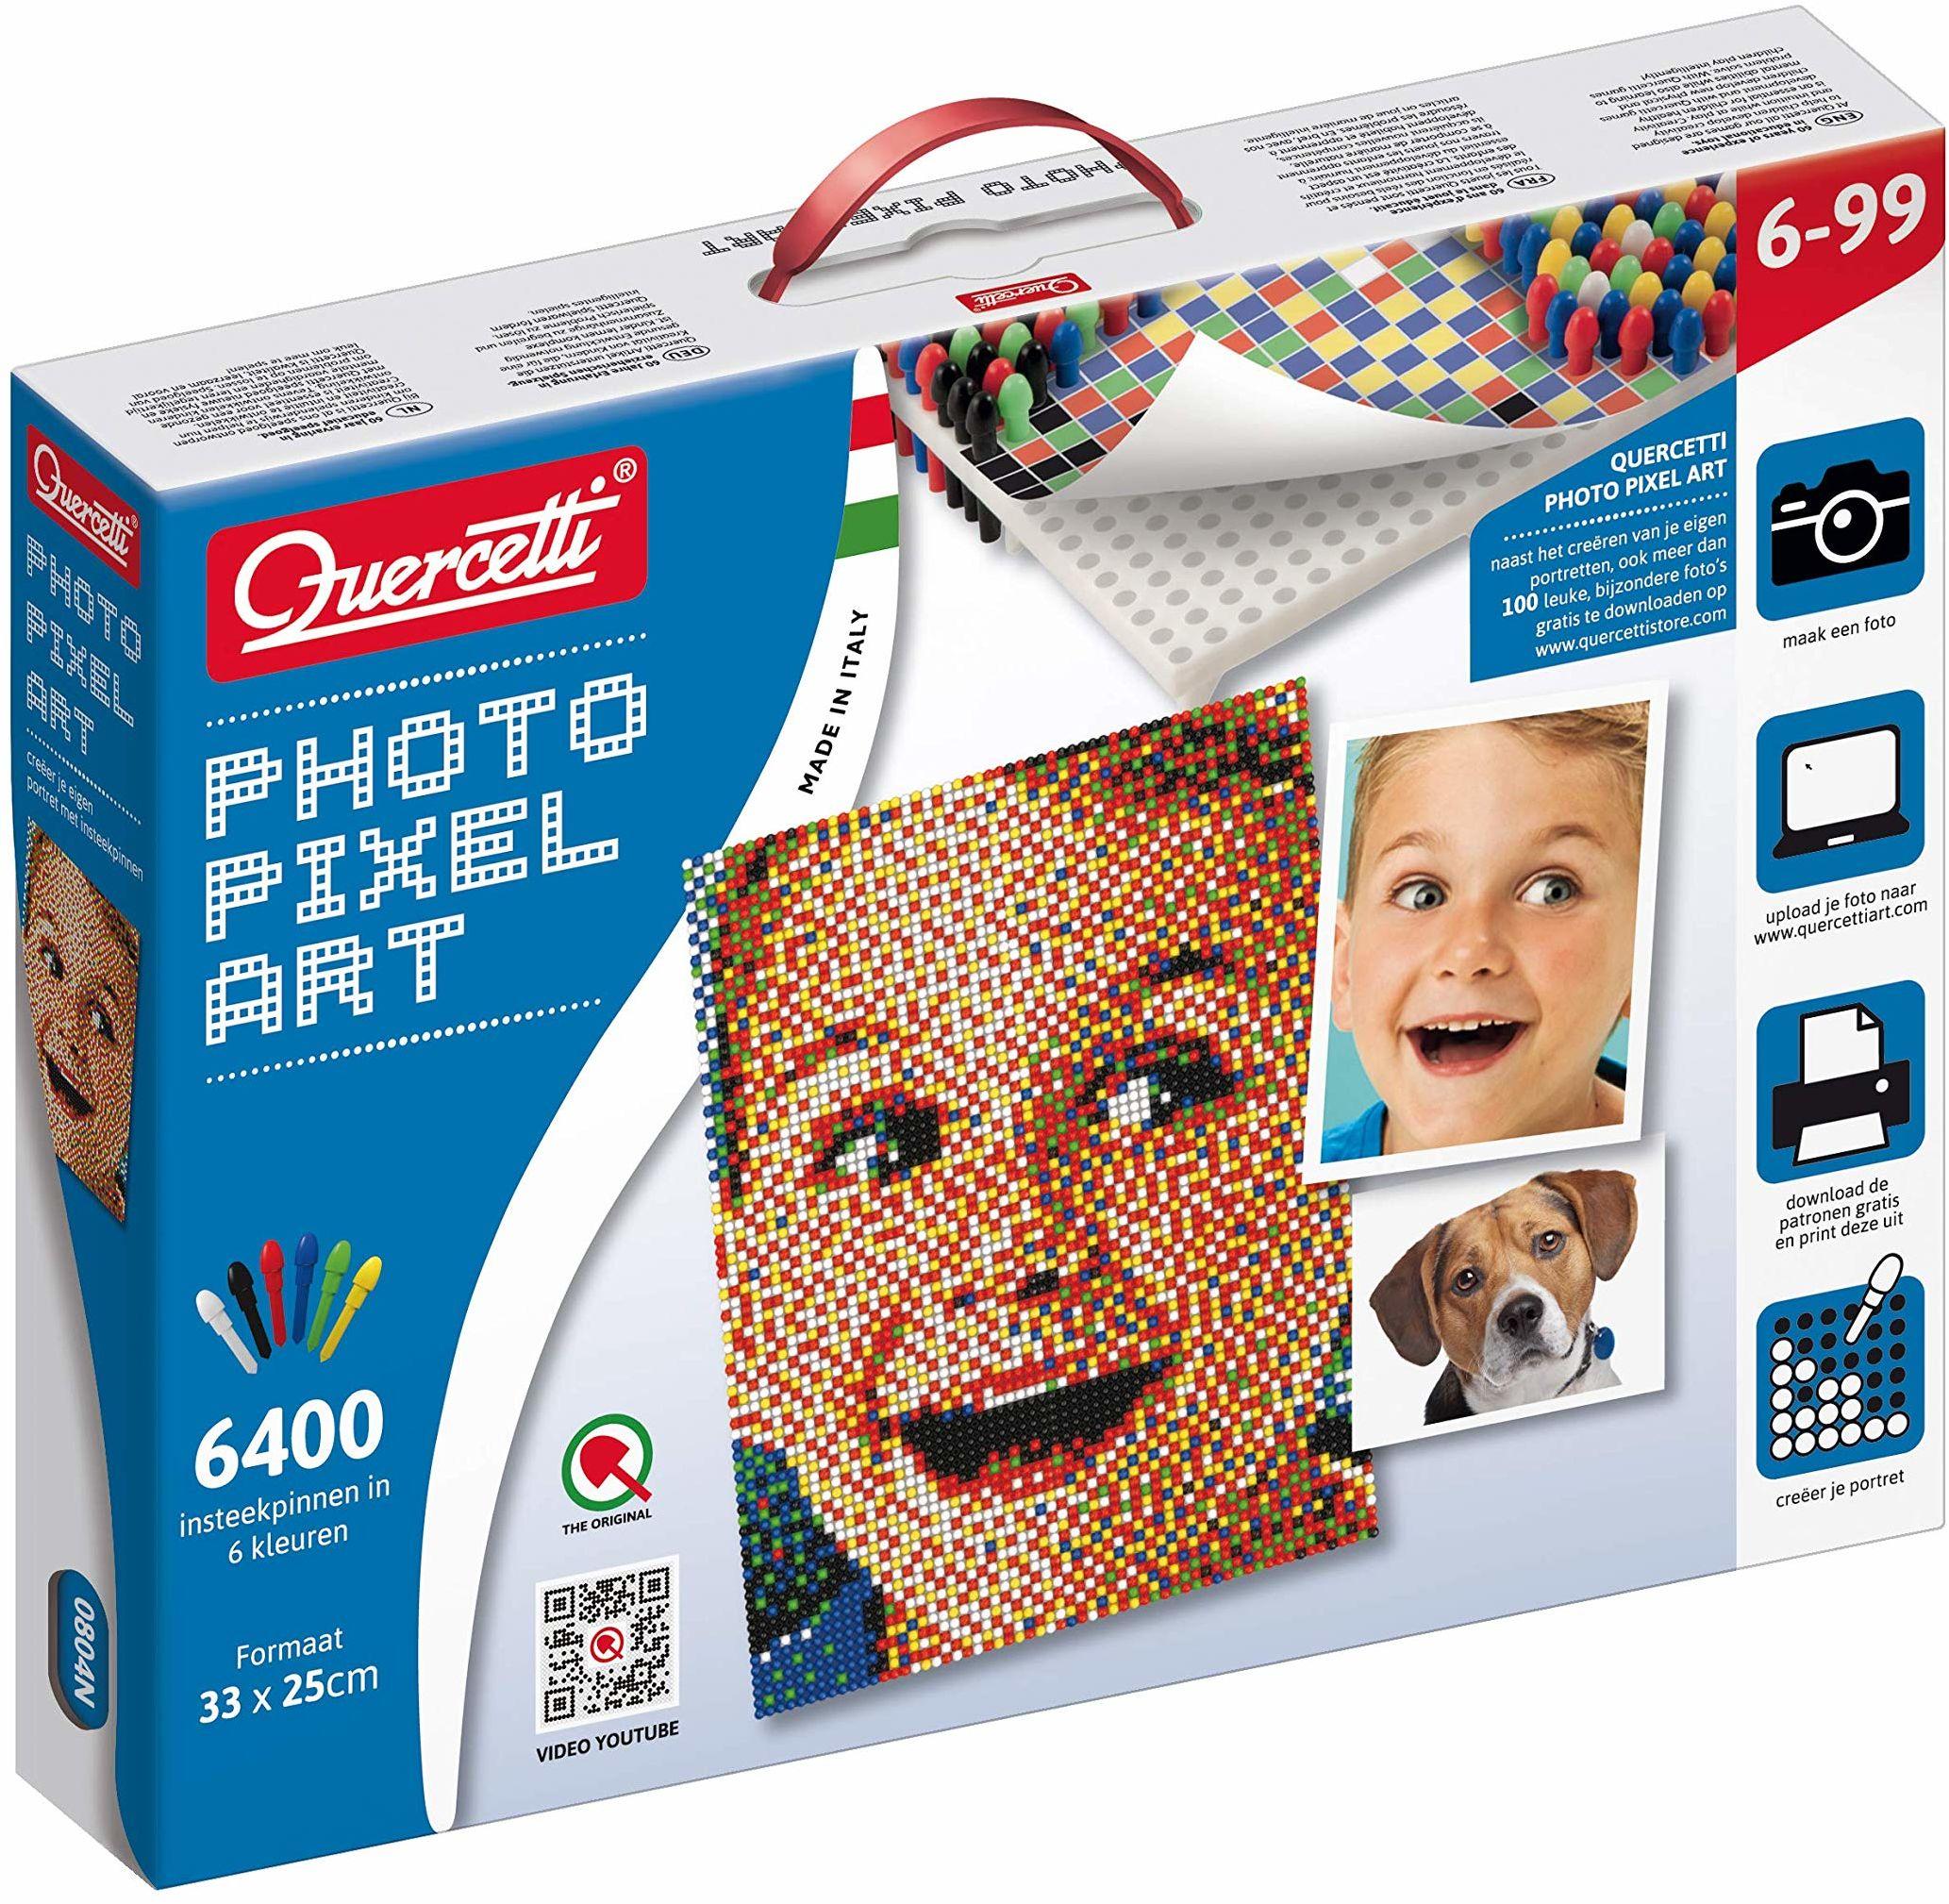 Quercetti 00804 - Pixel Art Photo mała gra wtykowa, wielokolorowa